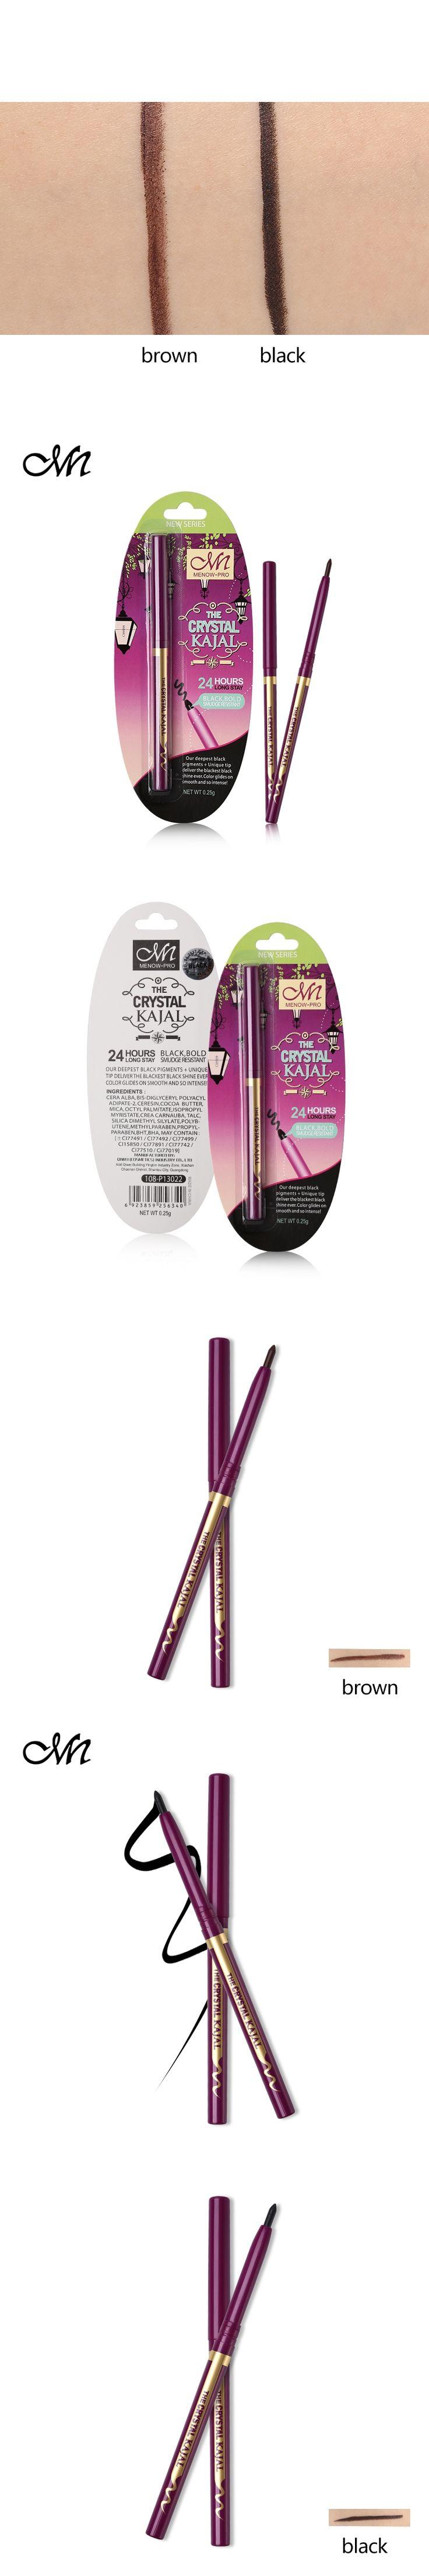 Menow Brand Pro Gel Eyeliner Pencil 24H Waterproof Lasting Makeup Smudge-proof Smoky Pigment Black Eye Liner Pen Automatic Tools